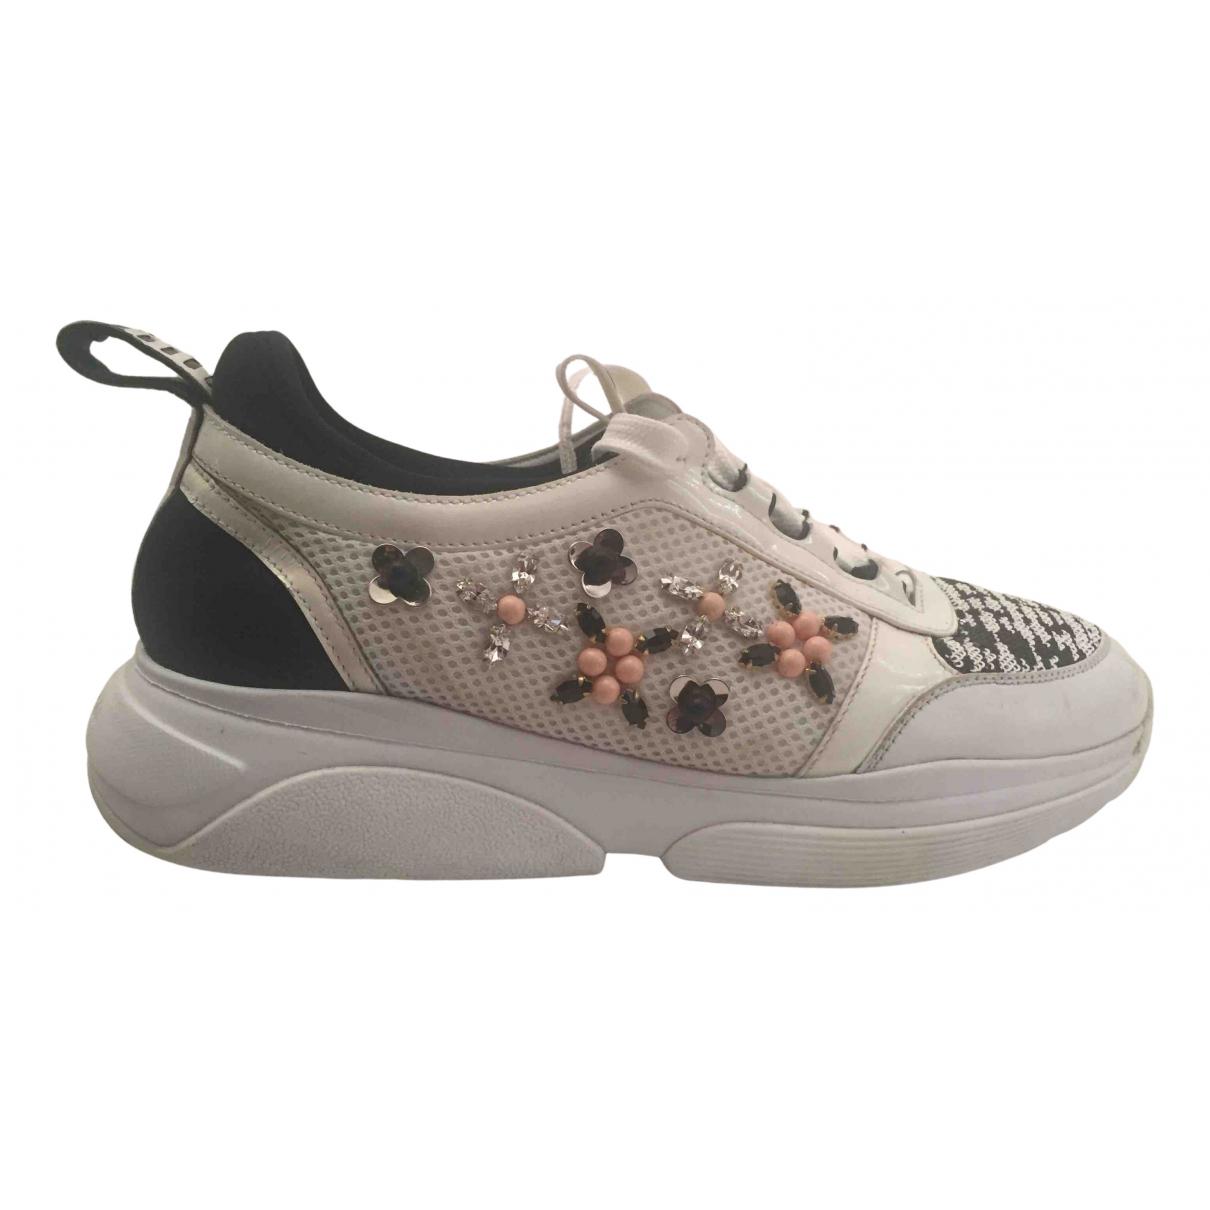 Louis Vuitton N Multicolour Glitter Trainers for Women 37 EU